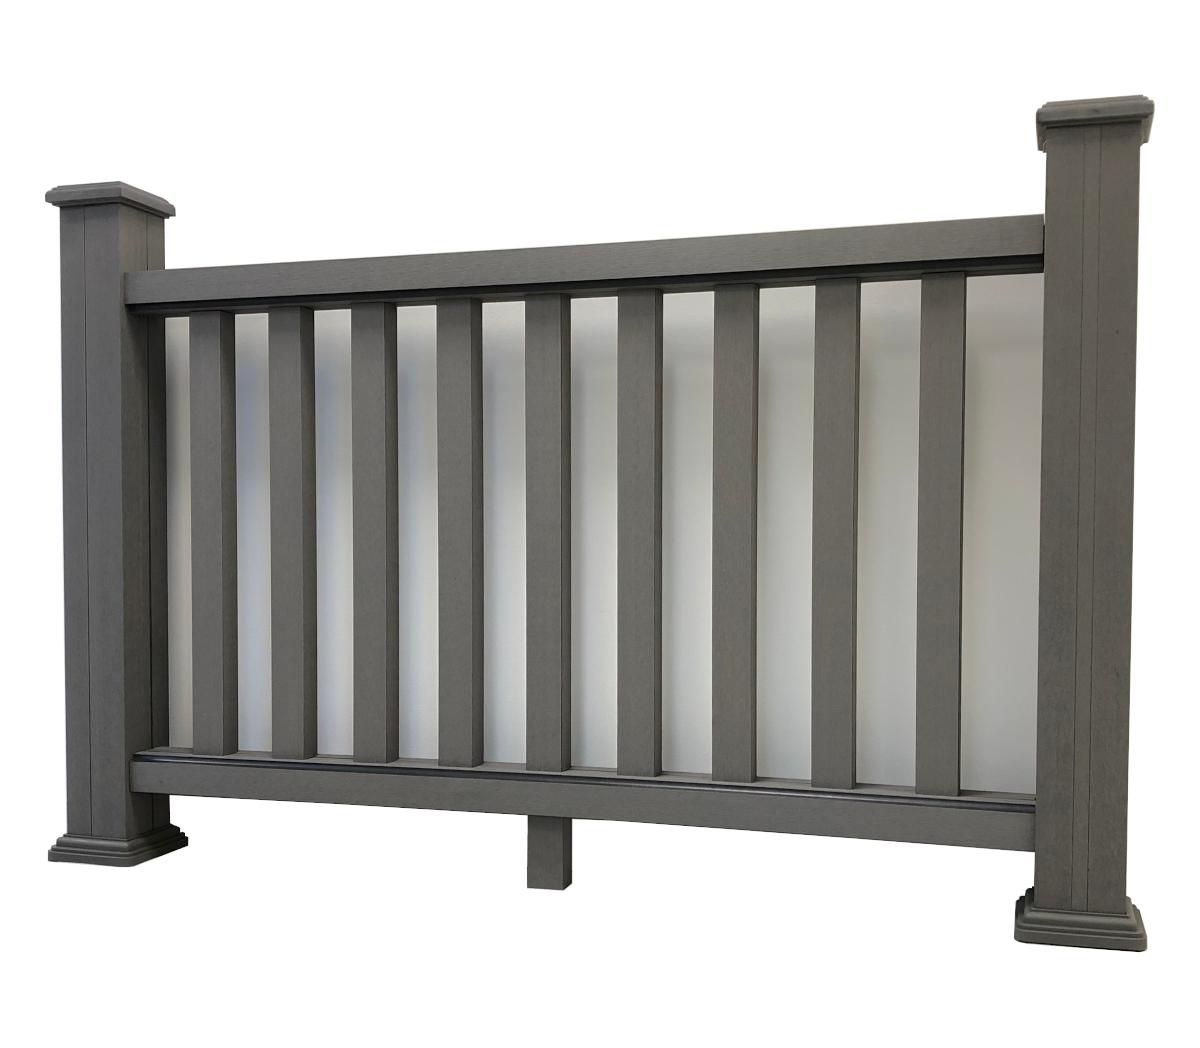 staket i träkomposit ljusgrå